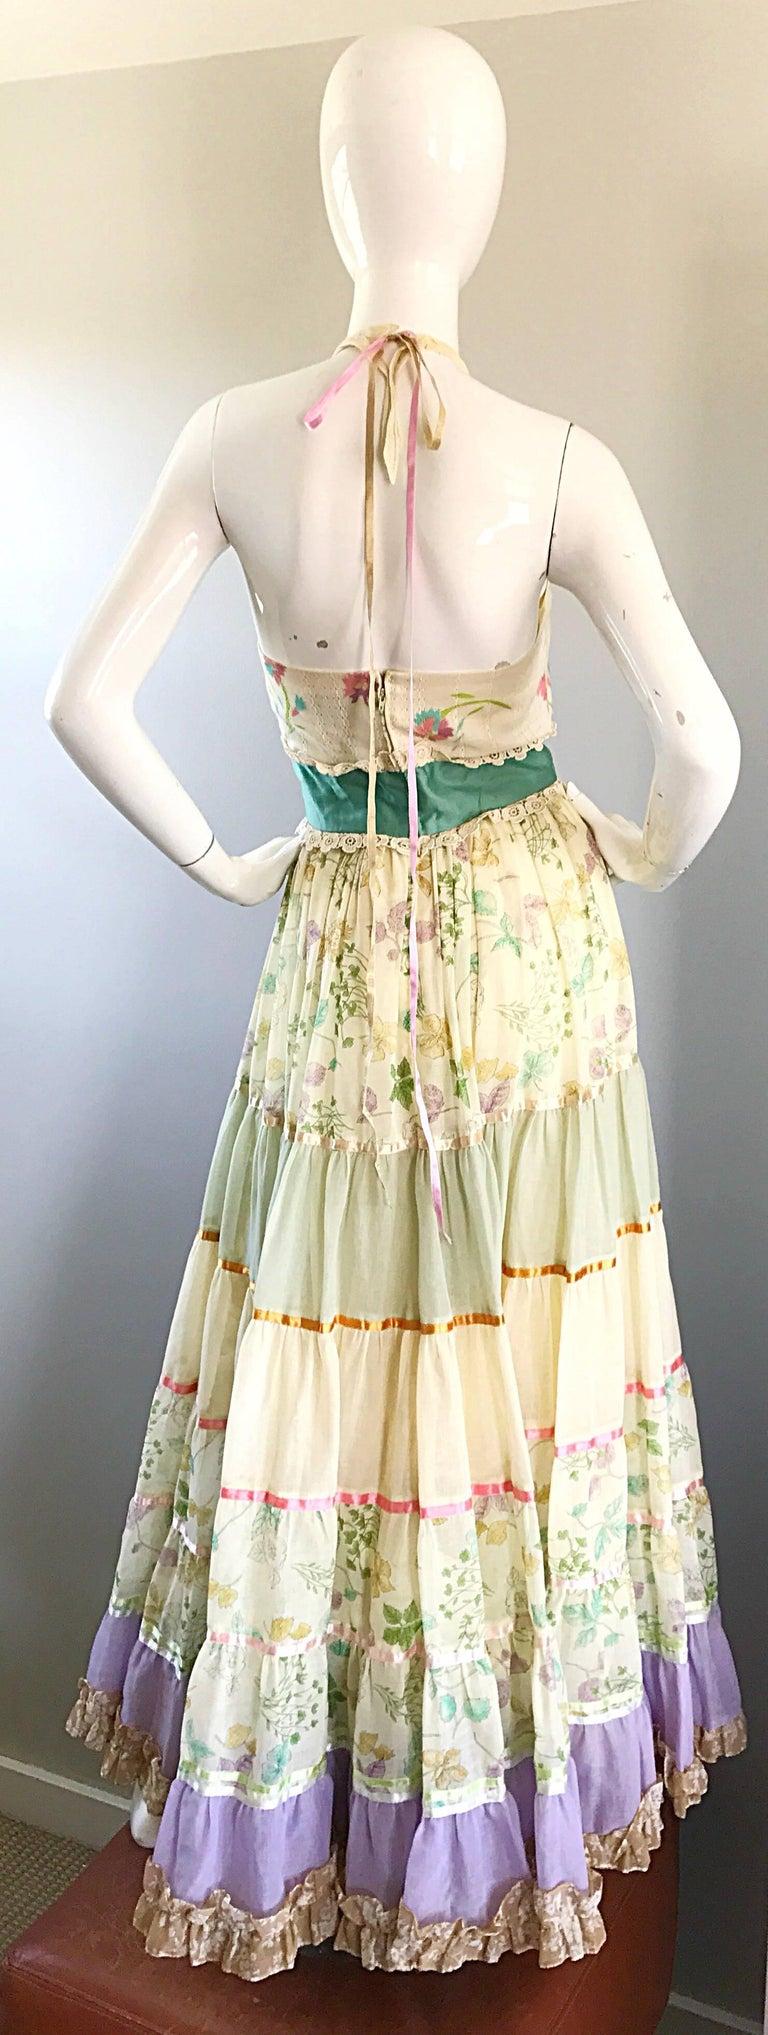 Giorgio di Sant Angelo 1970s Rare Colorful Cotton Voile Vintage 70s Maxi Dress In Excellent Condition For Sale In San Francisco, CA